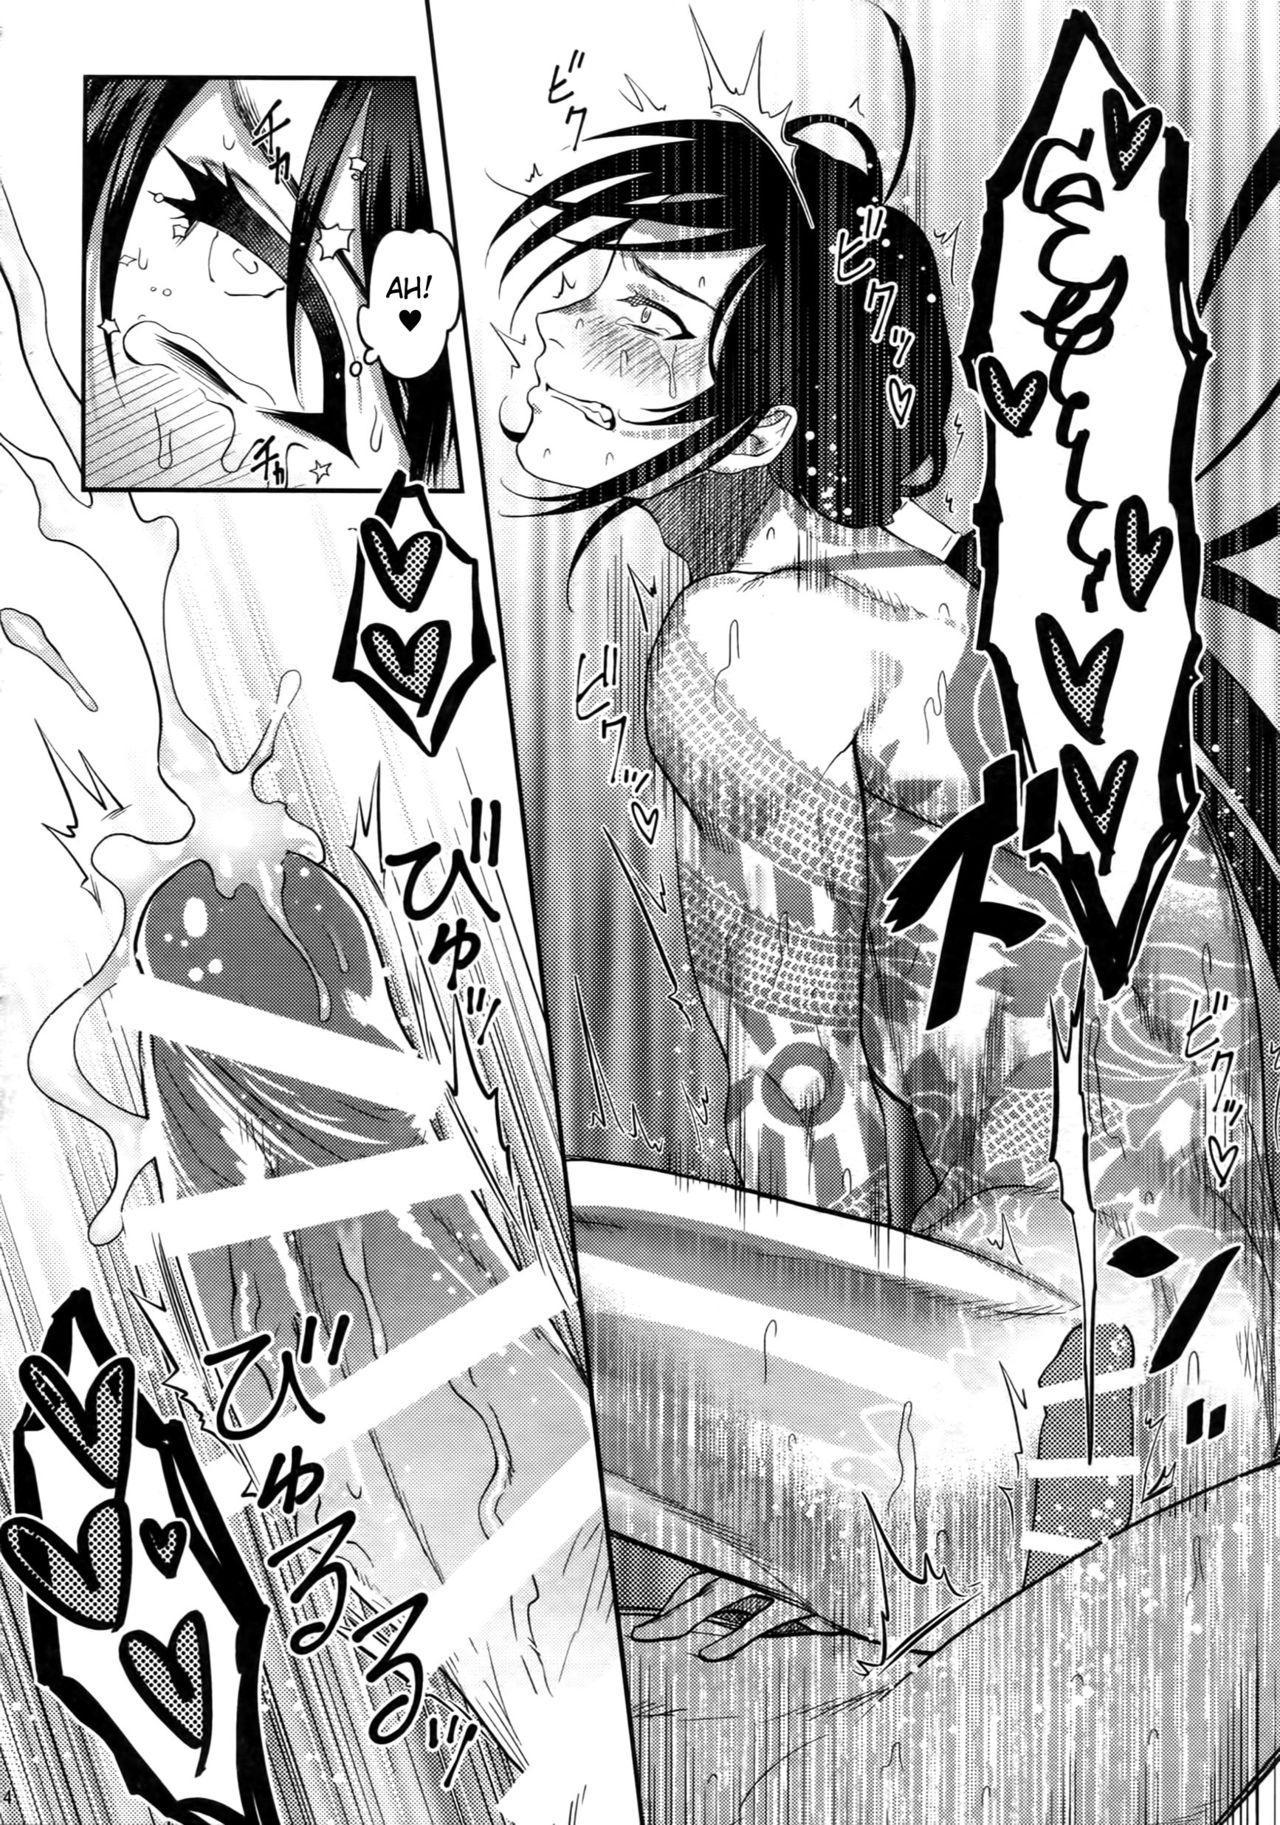 (Super ROOT 4 to 5 2019) [xxkorori (Ko Tora)] Kando 500-bai Yami no Kyoukaku Nonstop Namahame 24-ji | 500-times Enhanced 24-hour Nonstop Raw Sex Session with the Guest of Darkness (Fate/Grand Order) [English] [MintVoid] 13